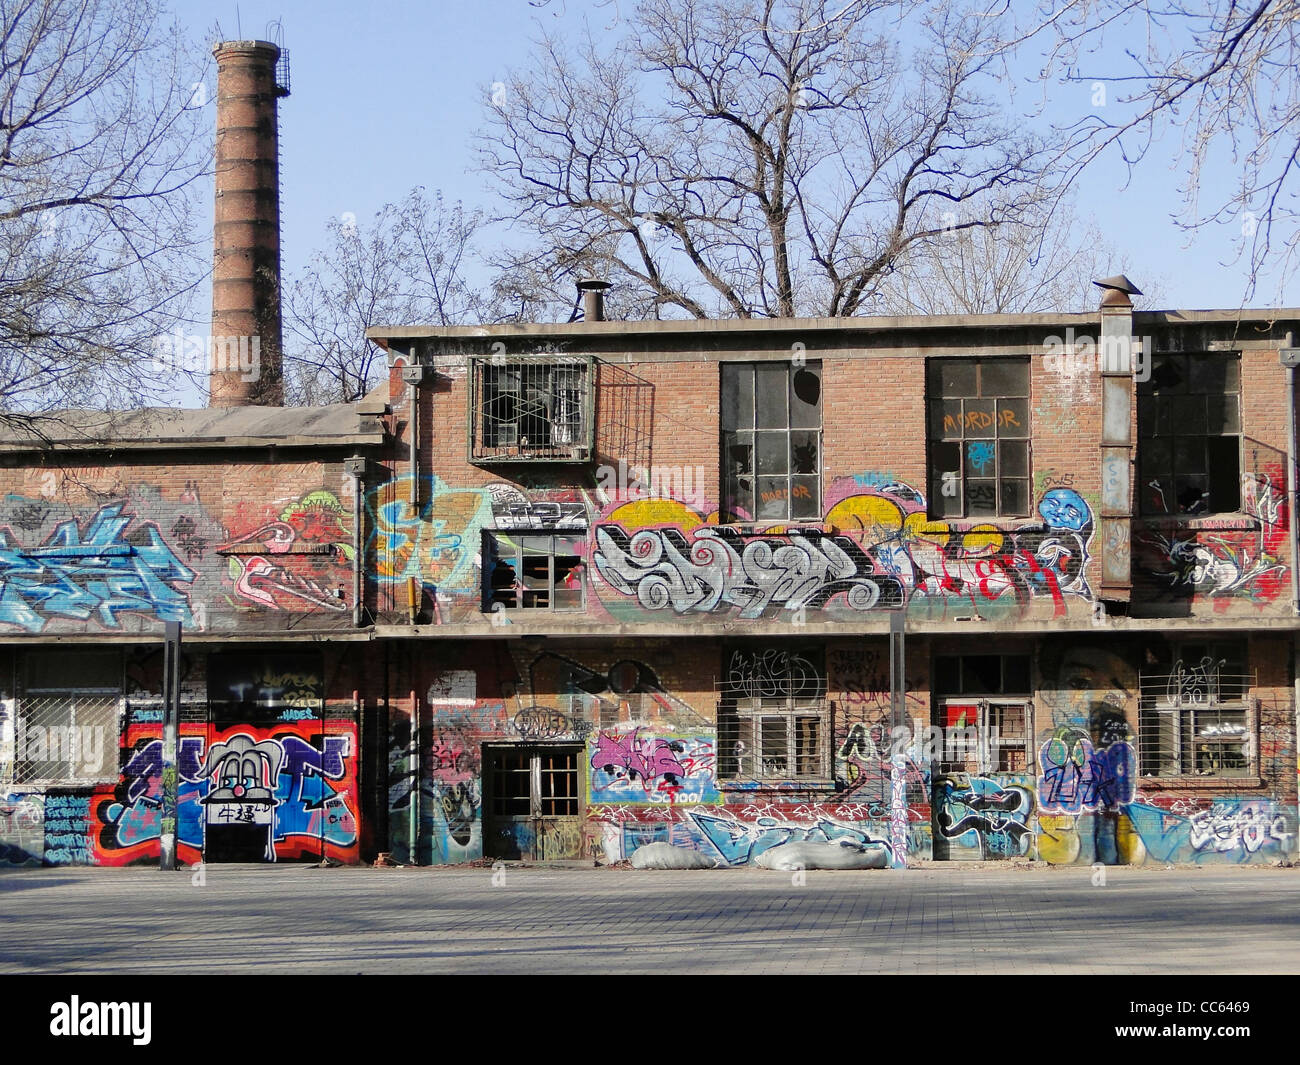 Verlassenen Werkstatt gemalt mit Graffiti, 798 Art Zone, Peking, China Stockbild